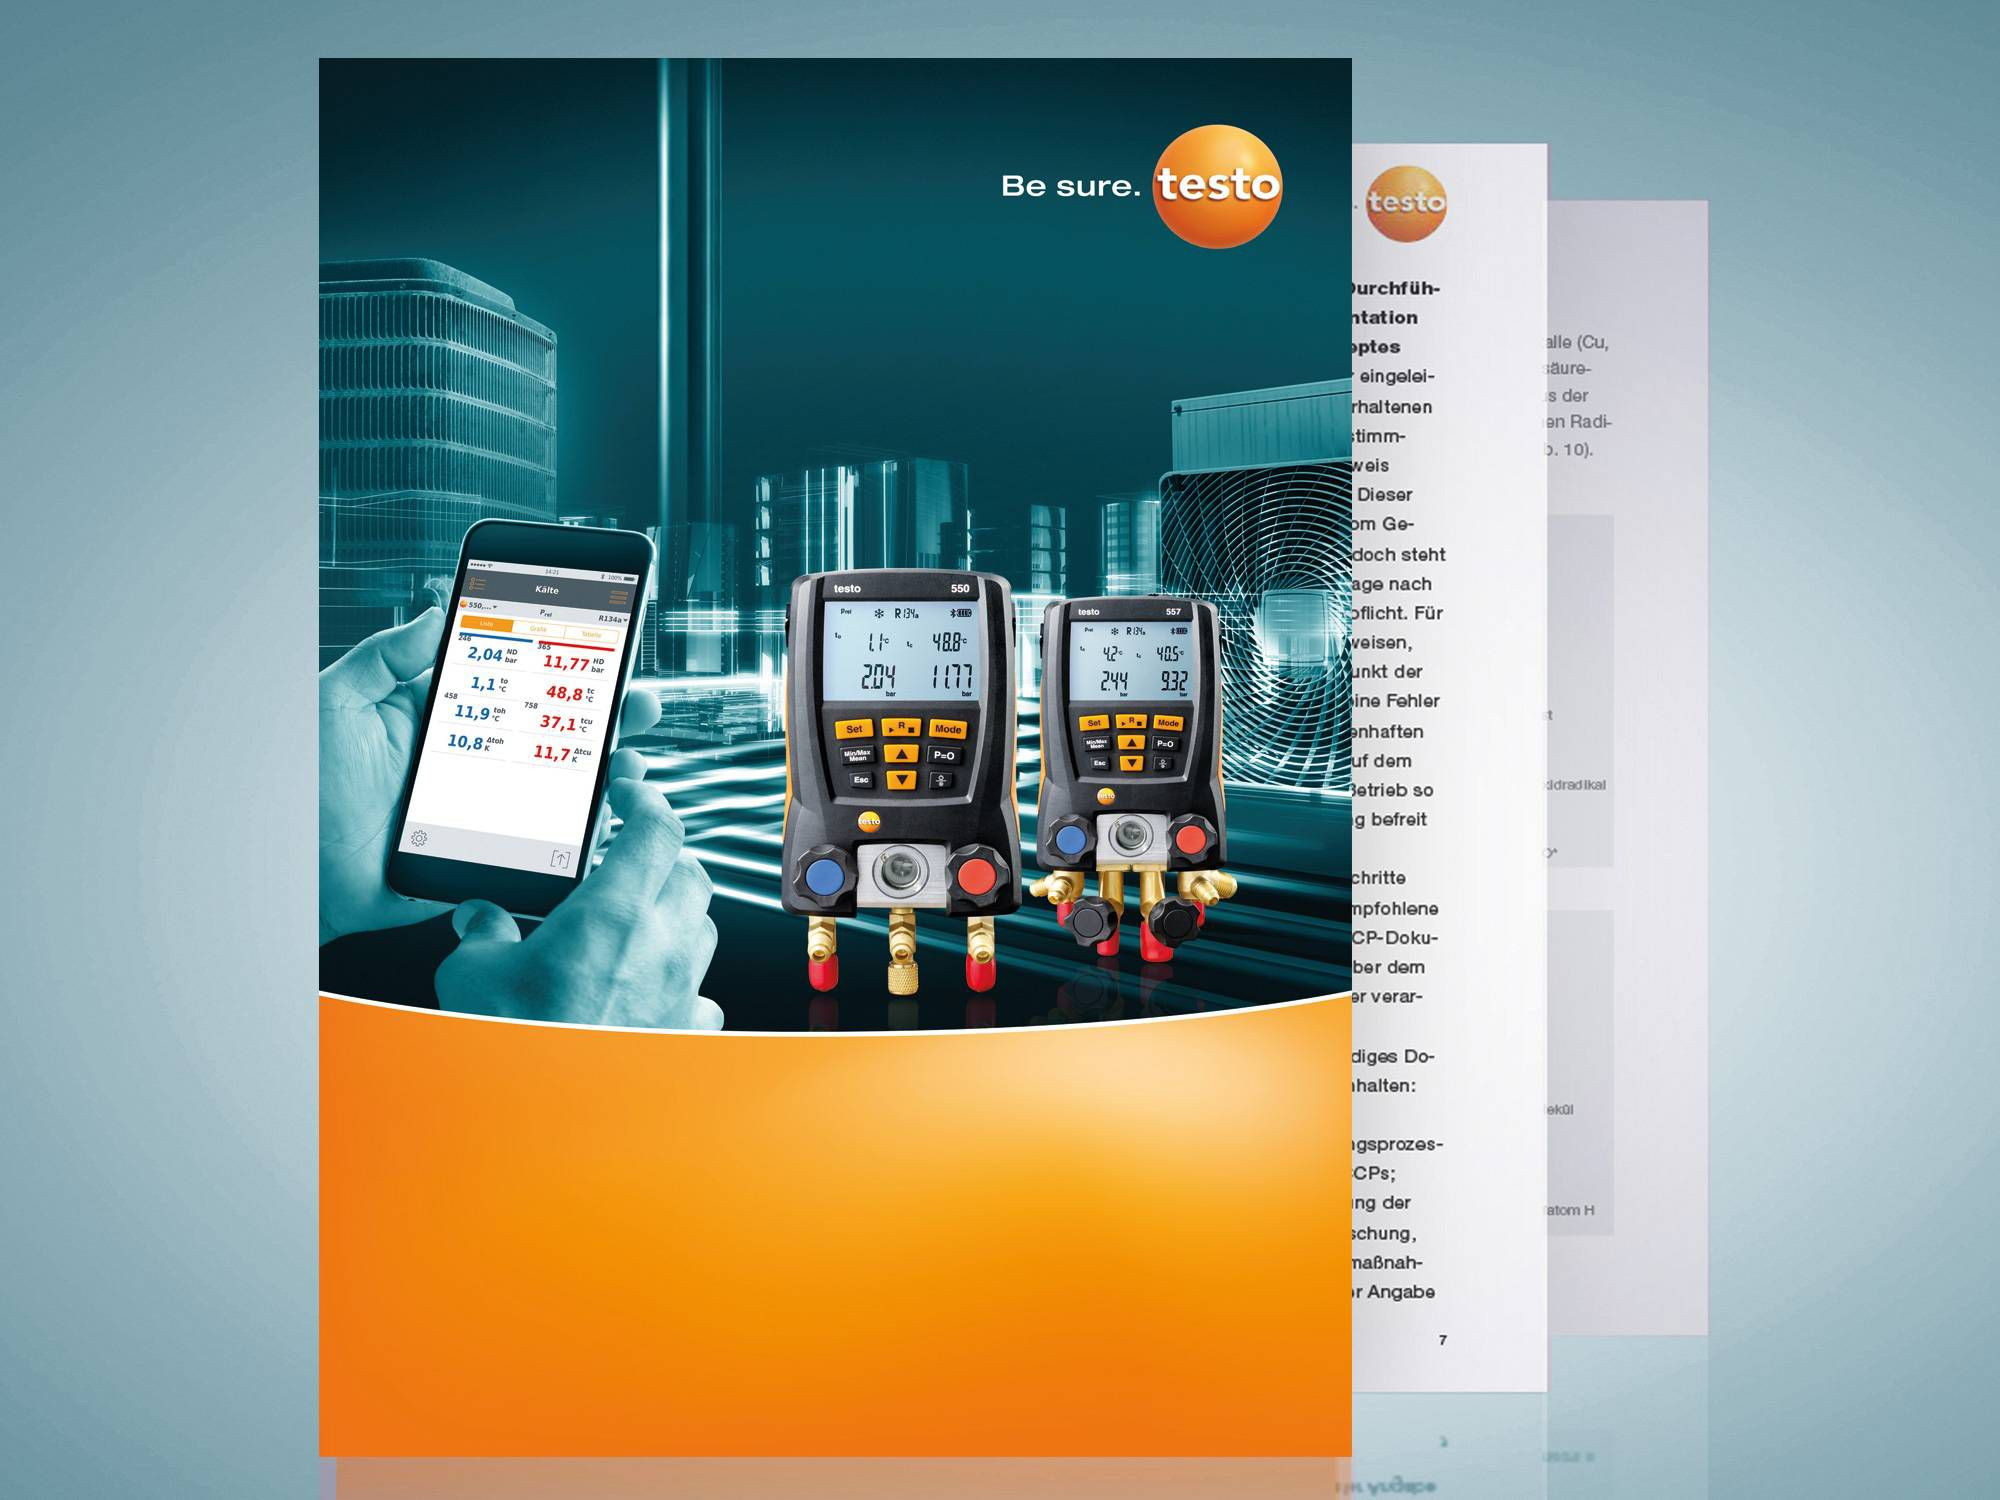 2000x1500-download-practical-guide-refrigeration.jpg